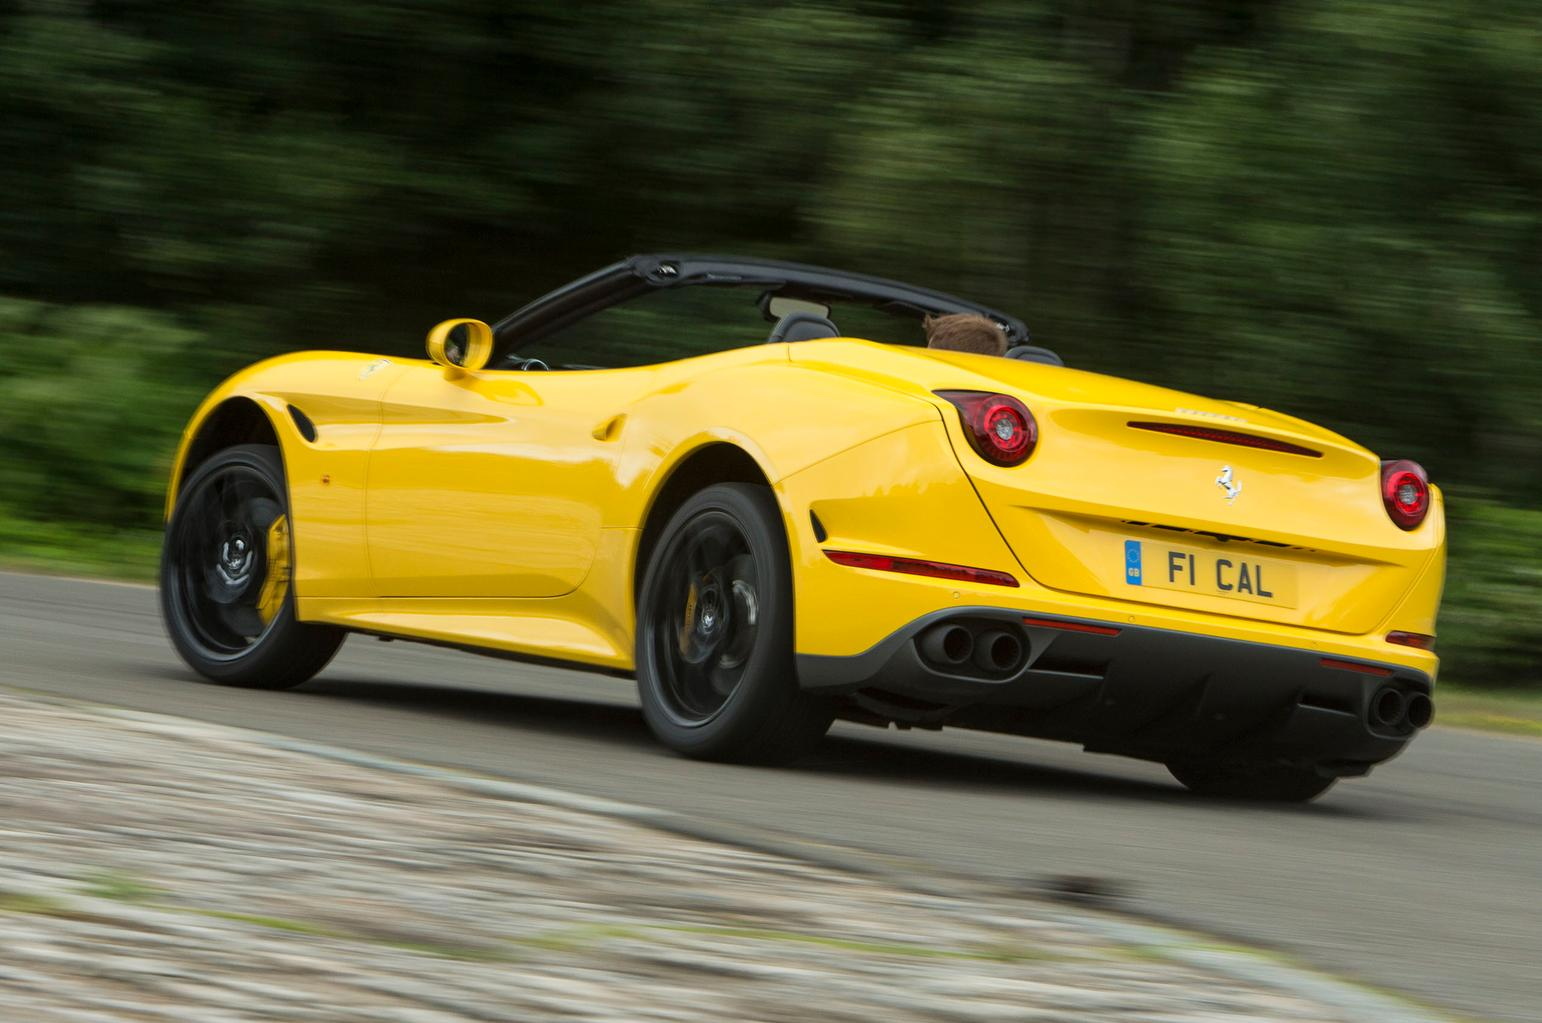 2016 Ferrari California T Handling Speciale review